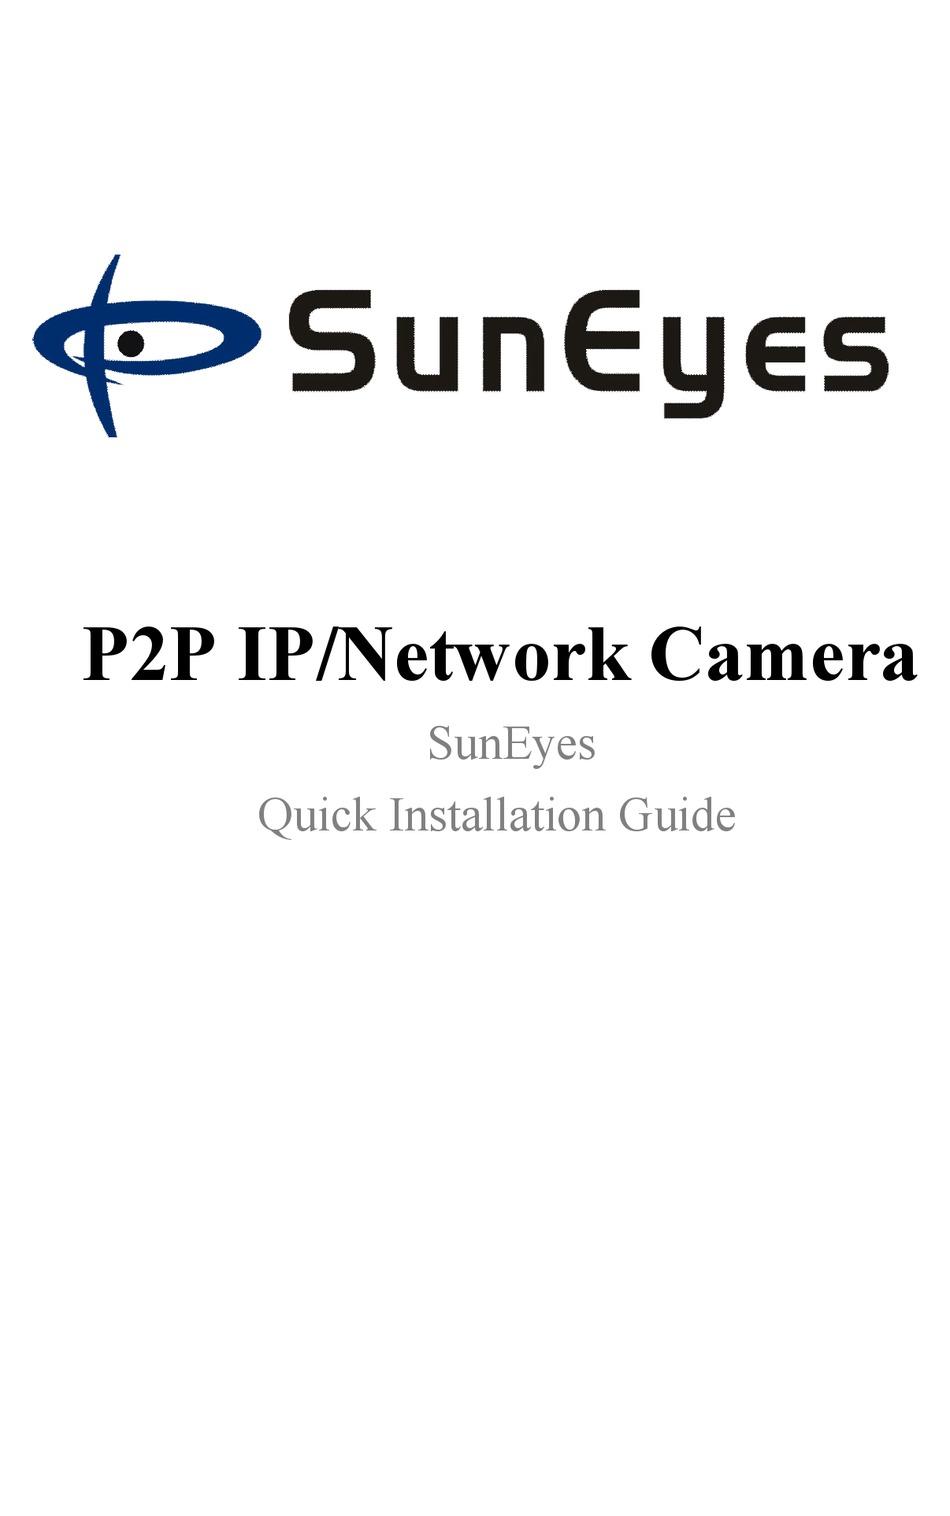 SUNEYES P2P QUICK INSTALLATION MANUAL Pdf Download